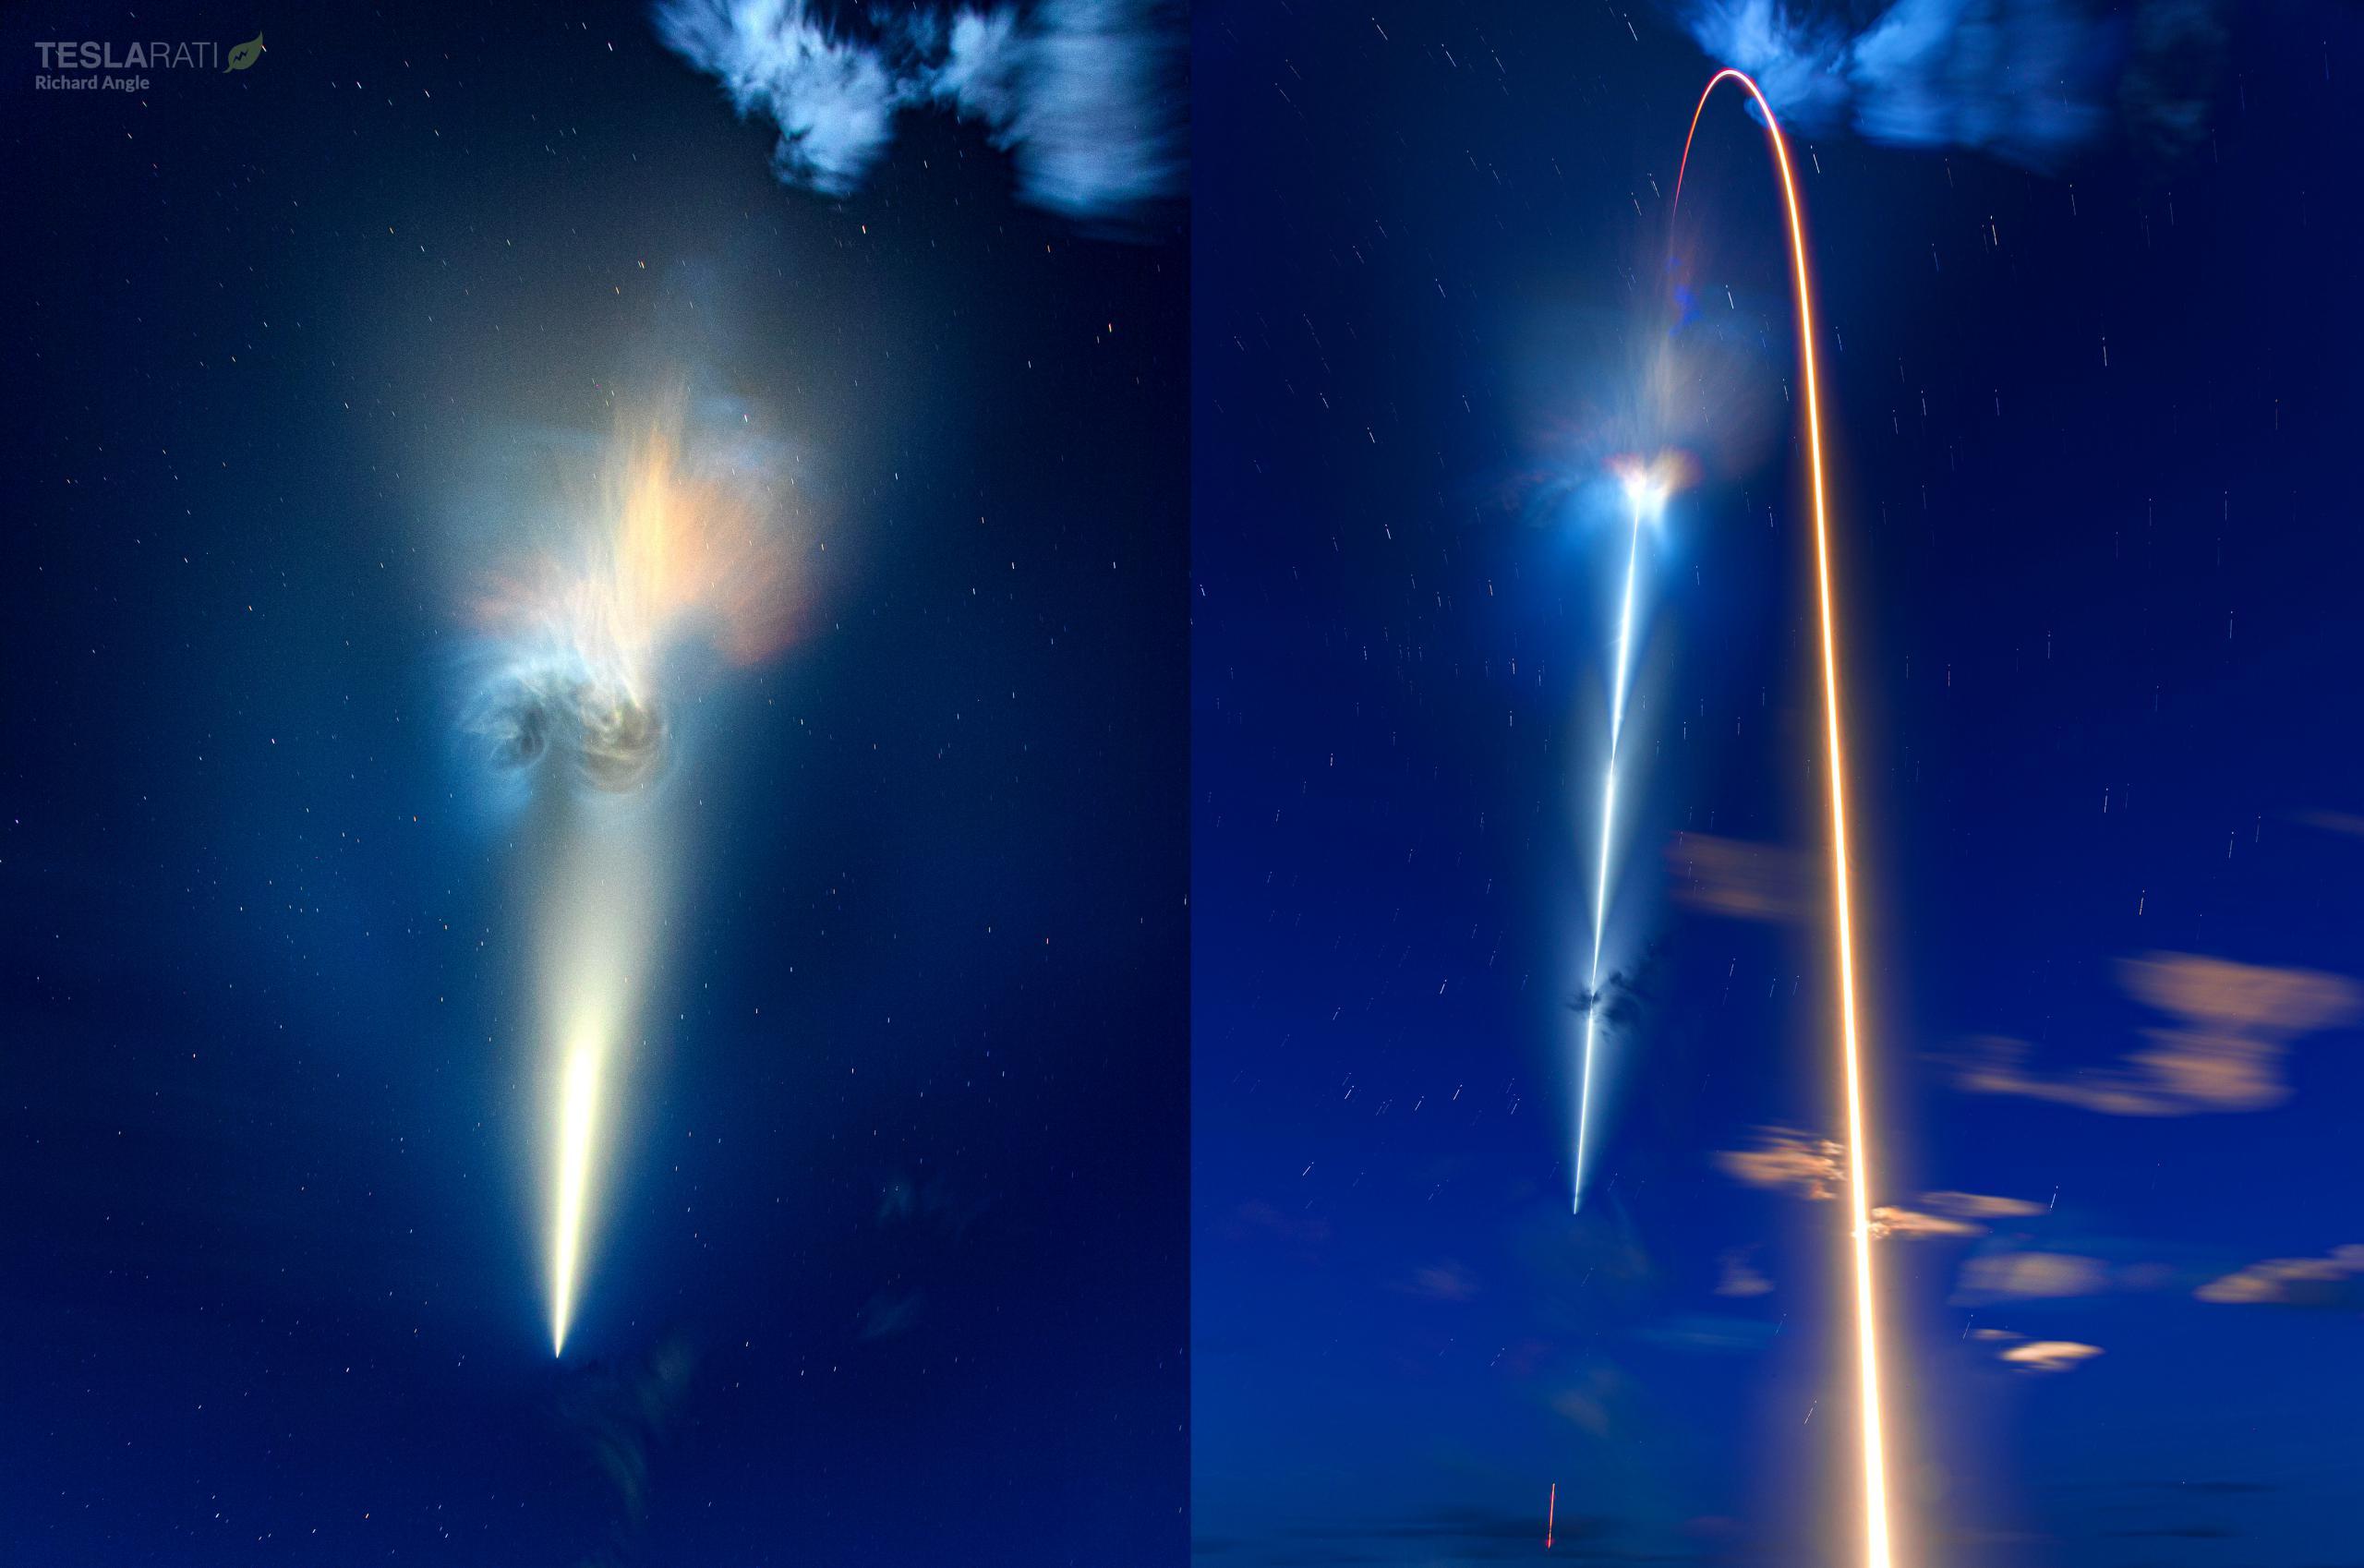 Inspiration4 Dragon C207 F9 B1062 39A 091521 (Richard Angle) streak + nebula 1 (c)